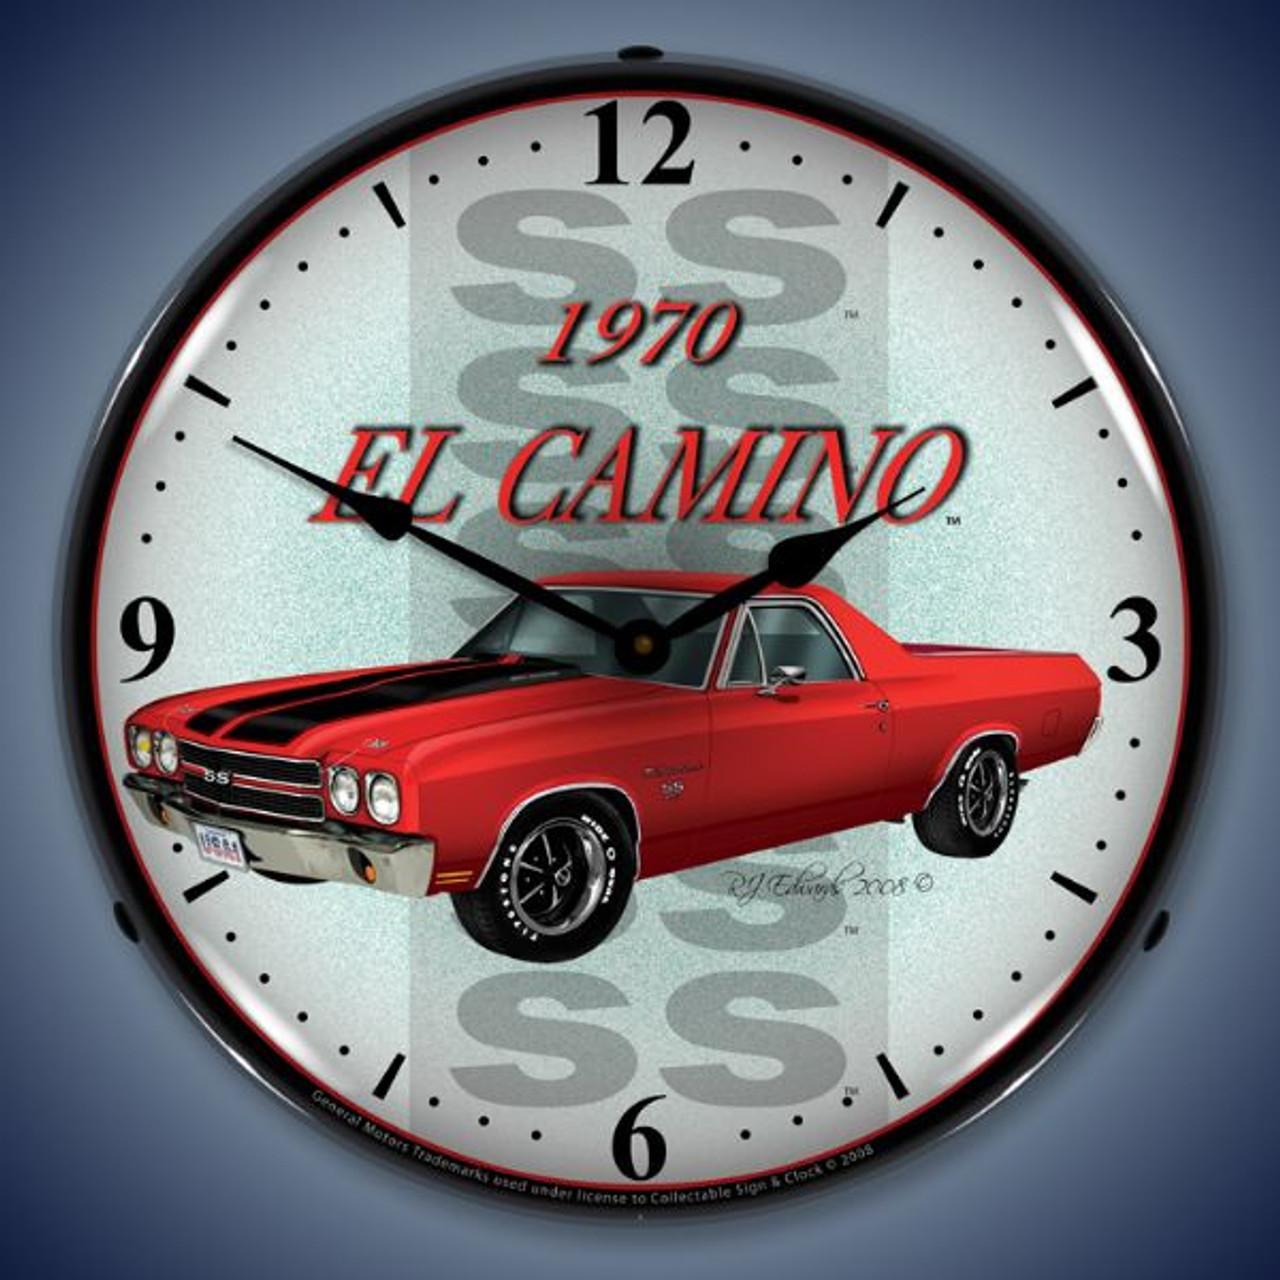 Retro  1970 El Camino Lighted Wall Clock 14 x 14 Inches